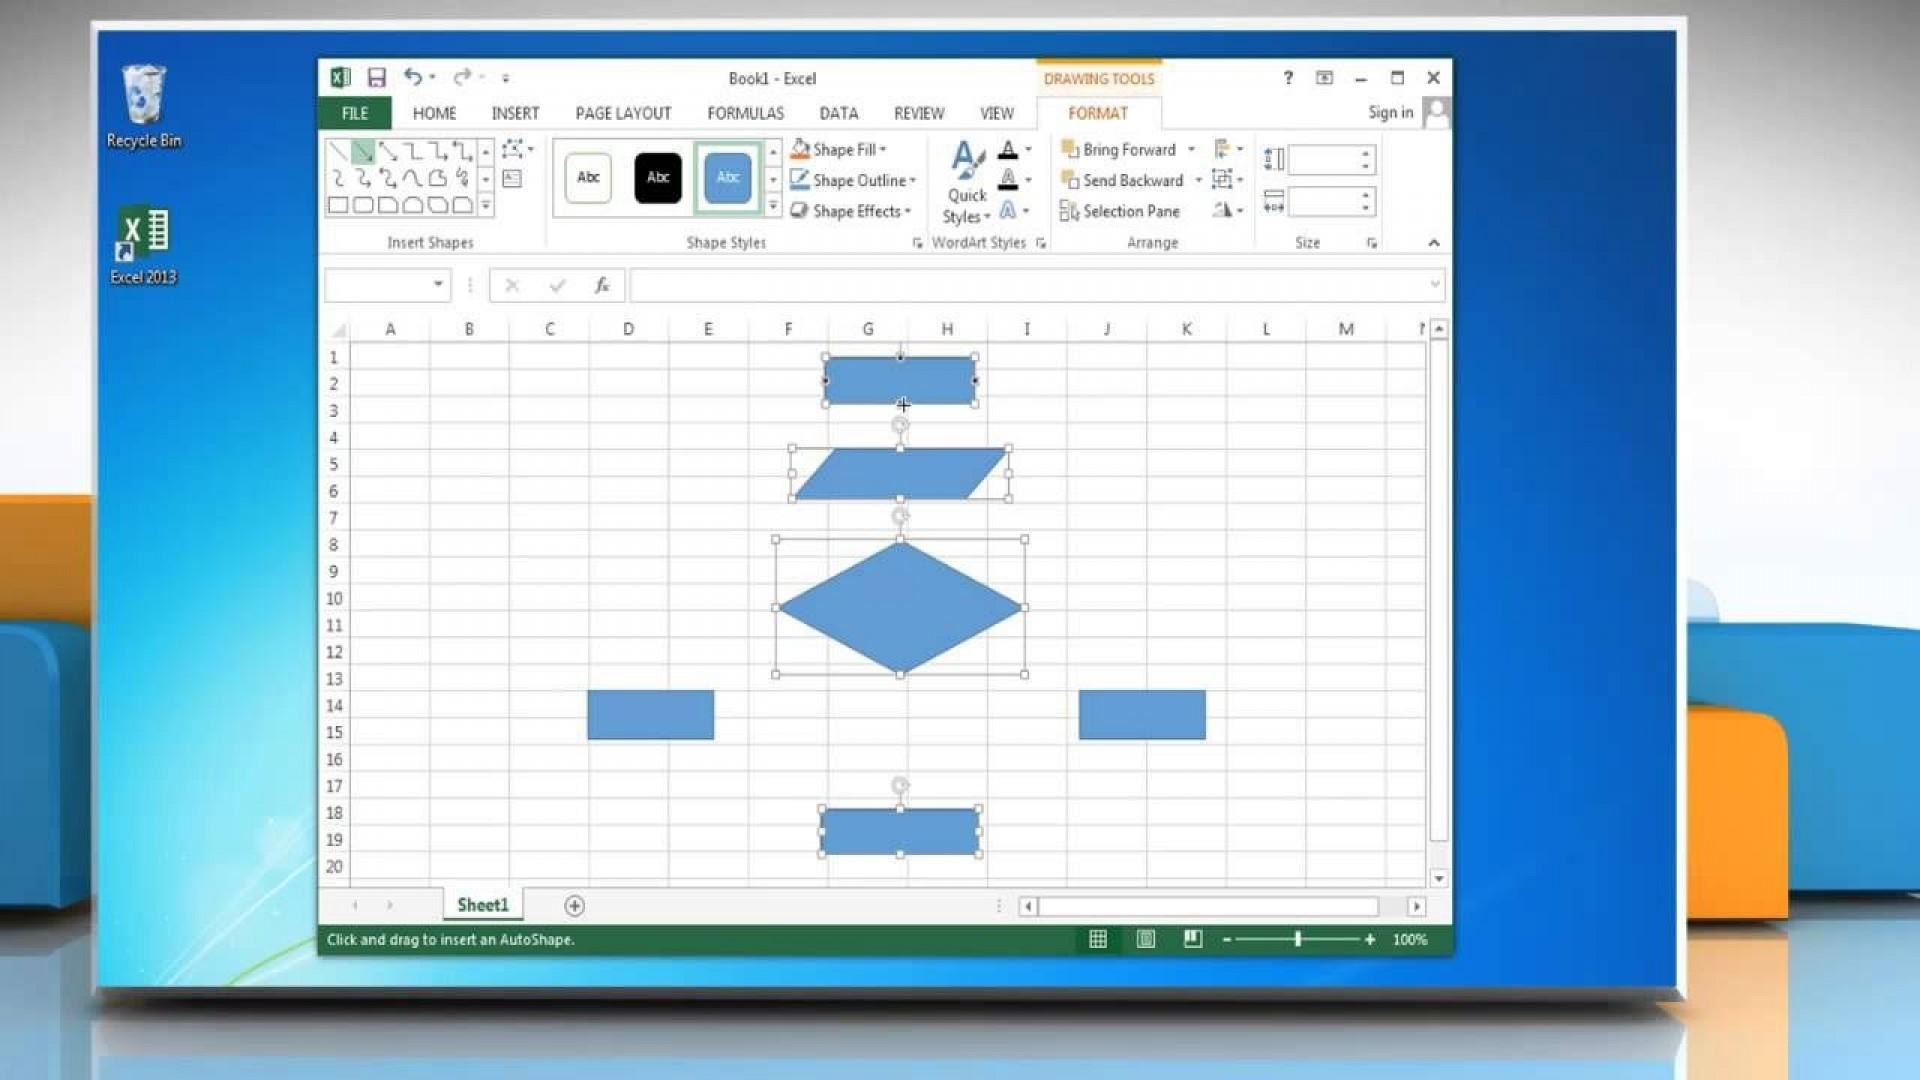 000 Singular Flow Chart Template Excel 2016 Highest Clarity 1920